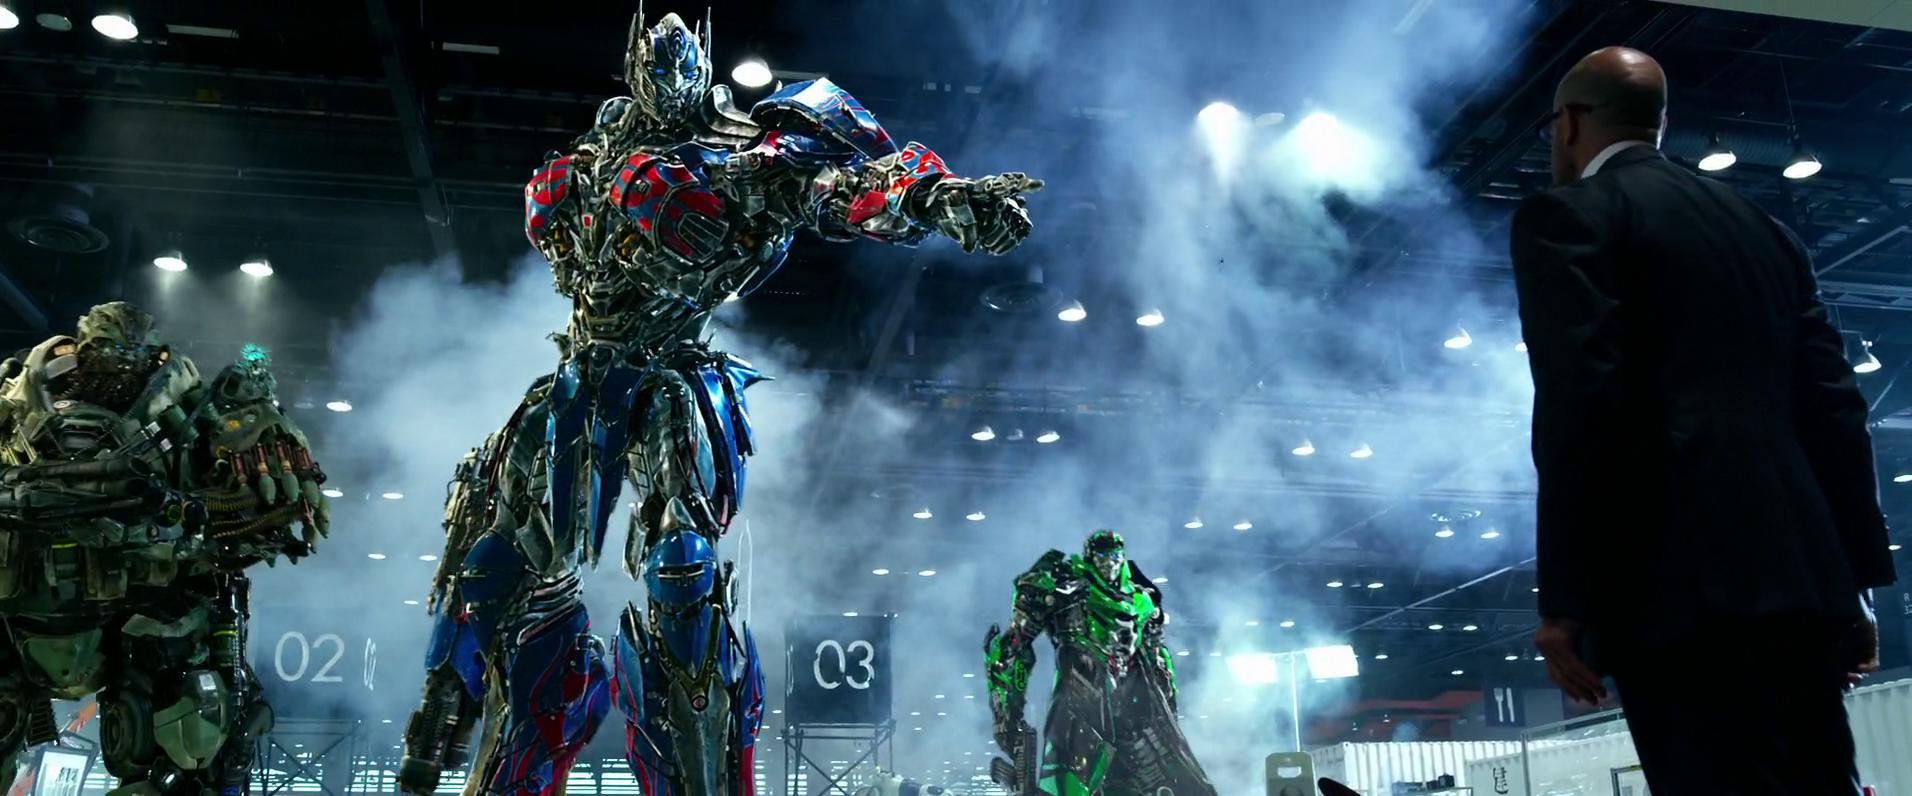 optimus prime | transformers film series wiki | fandom poweredwikia